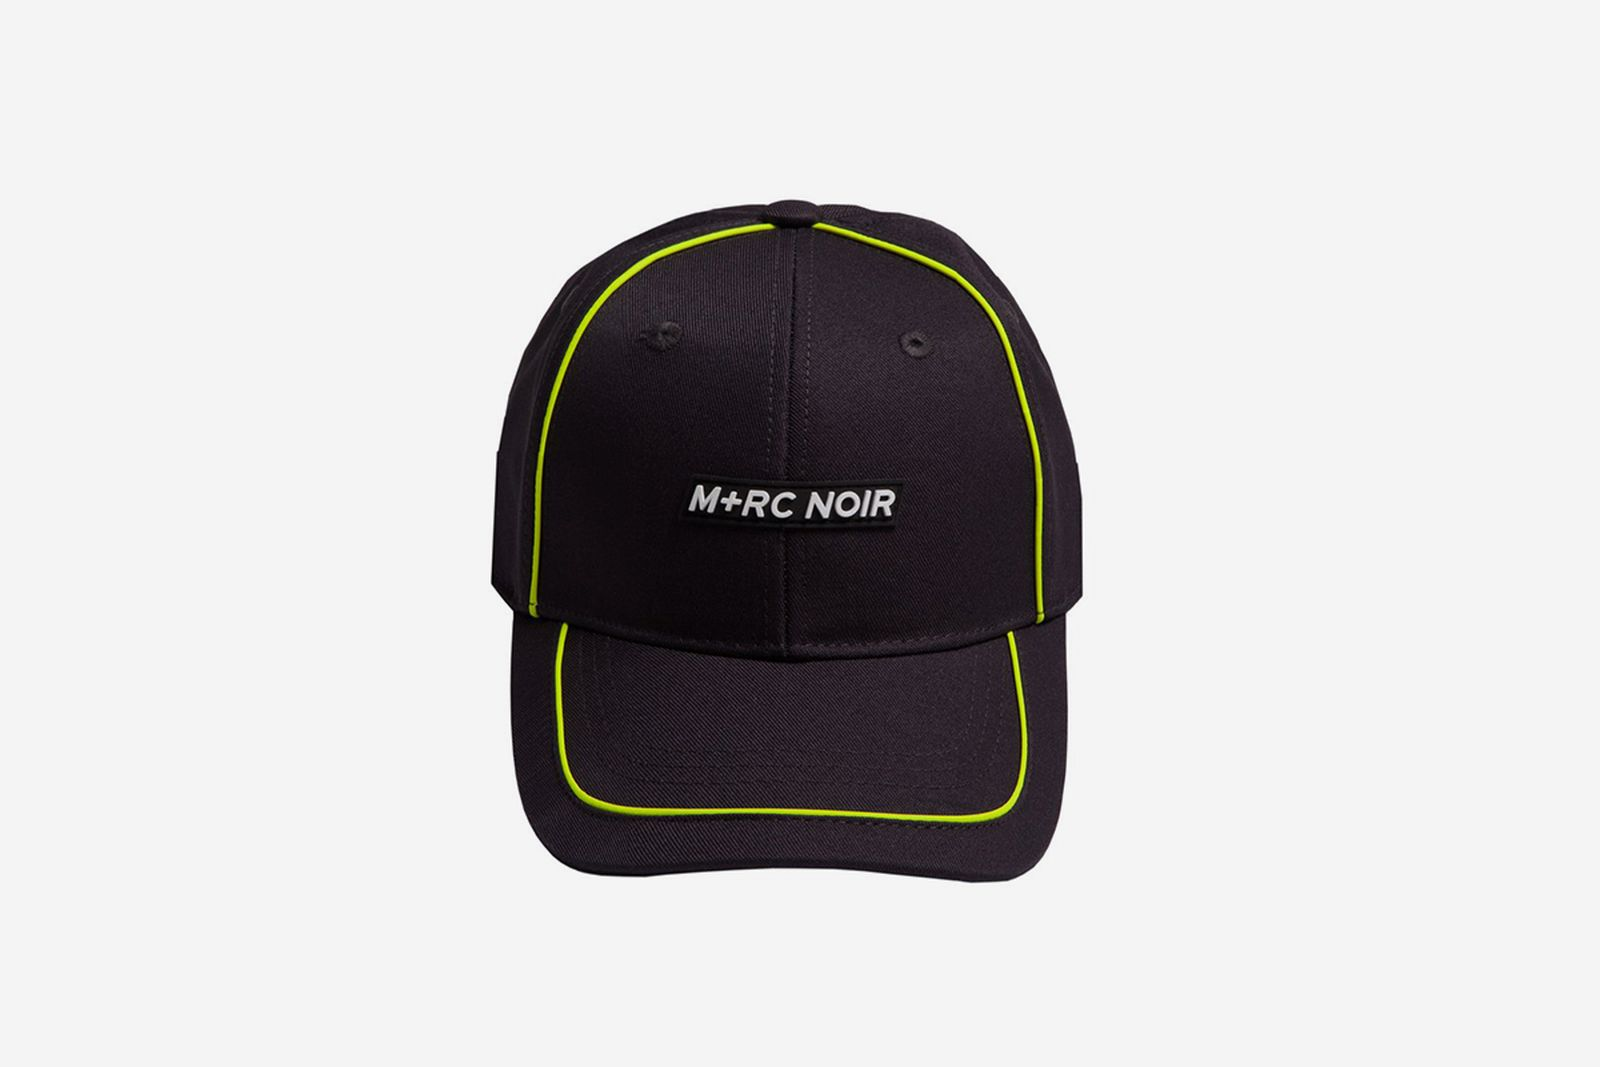 grey and yellow hat front M RC NOIR 1024x1024 M+RC NOIR SS18 playboi carti